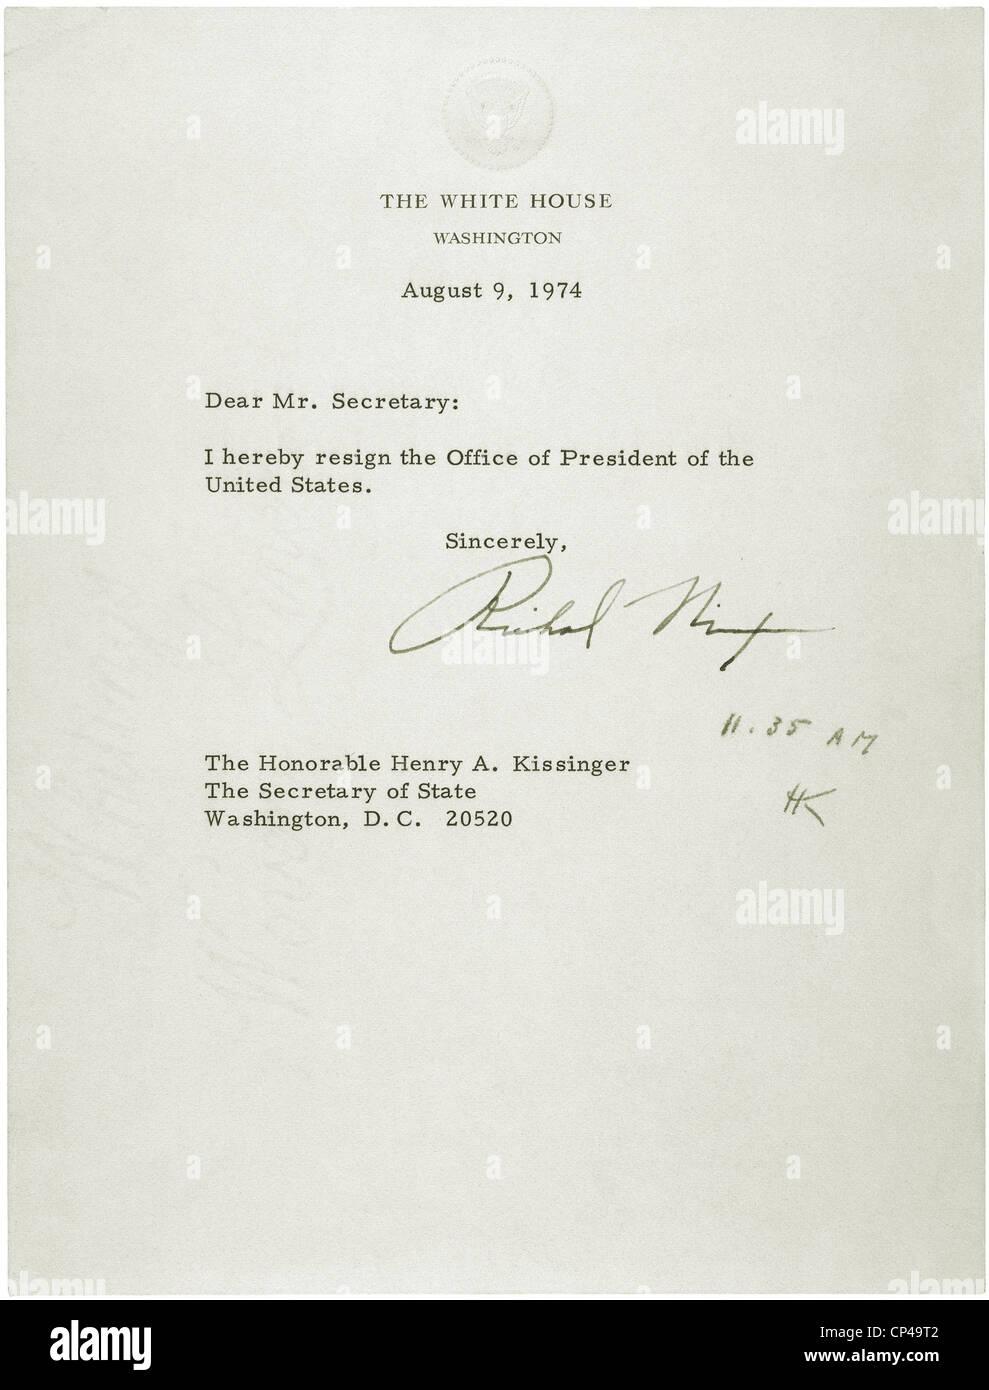 President Nixonu0027s Letter Of Resignation Was Addressed To Secretary Of State  Henry Kissinger. Aug. 9. 1974  Nixon Resignation Letter